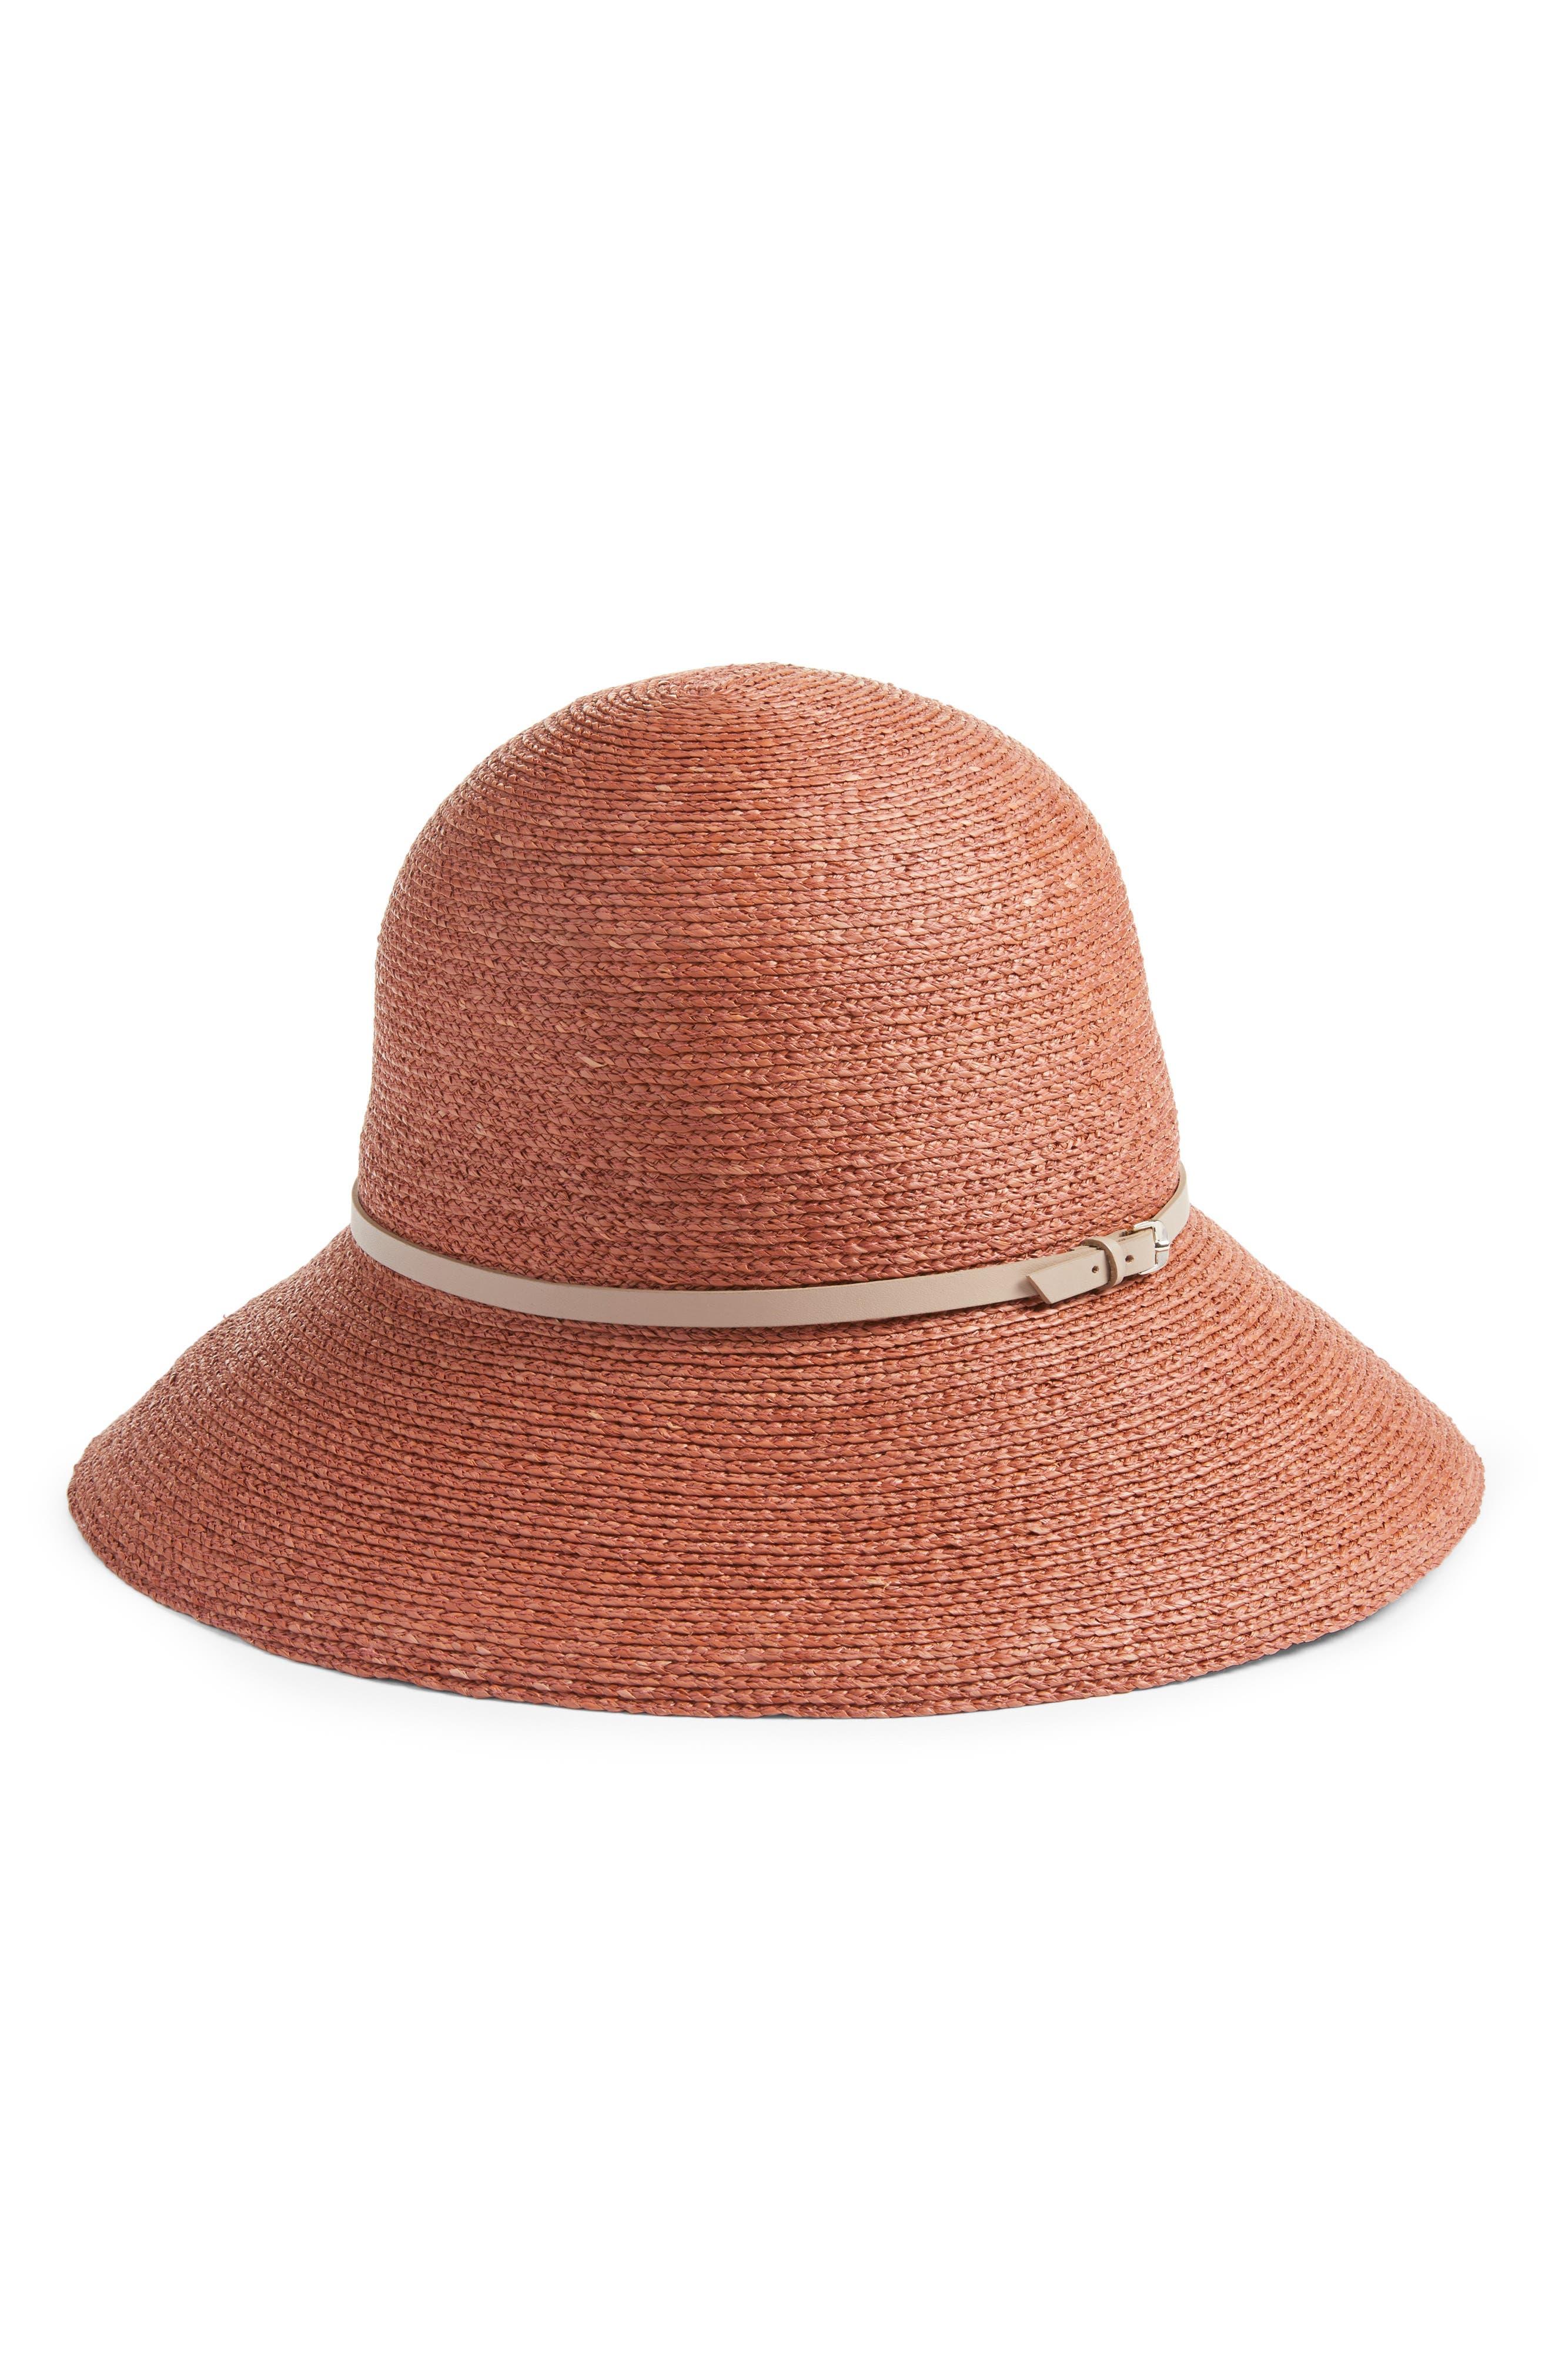 Helen Kaminski Packable Raffia Cloche Hat